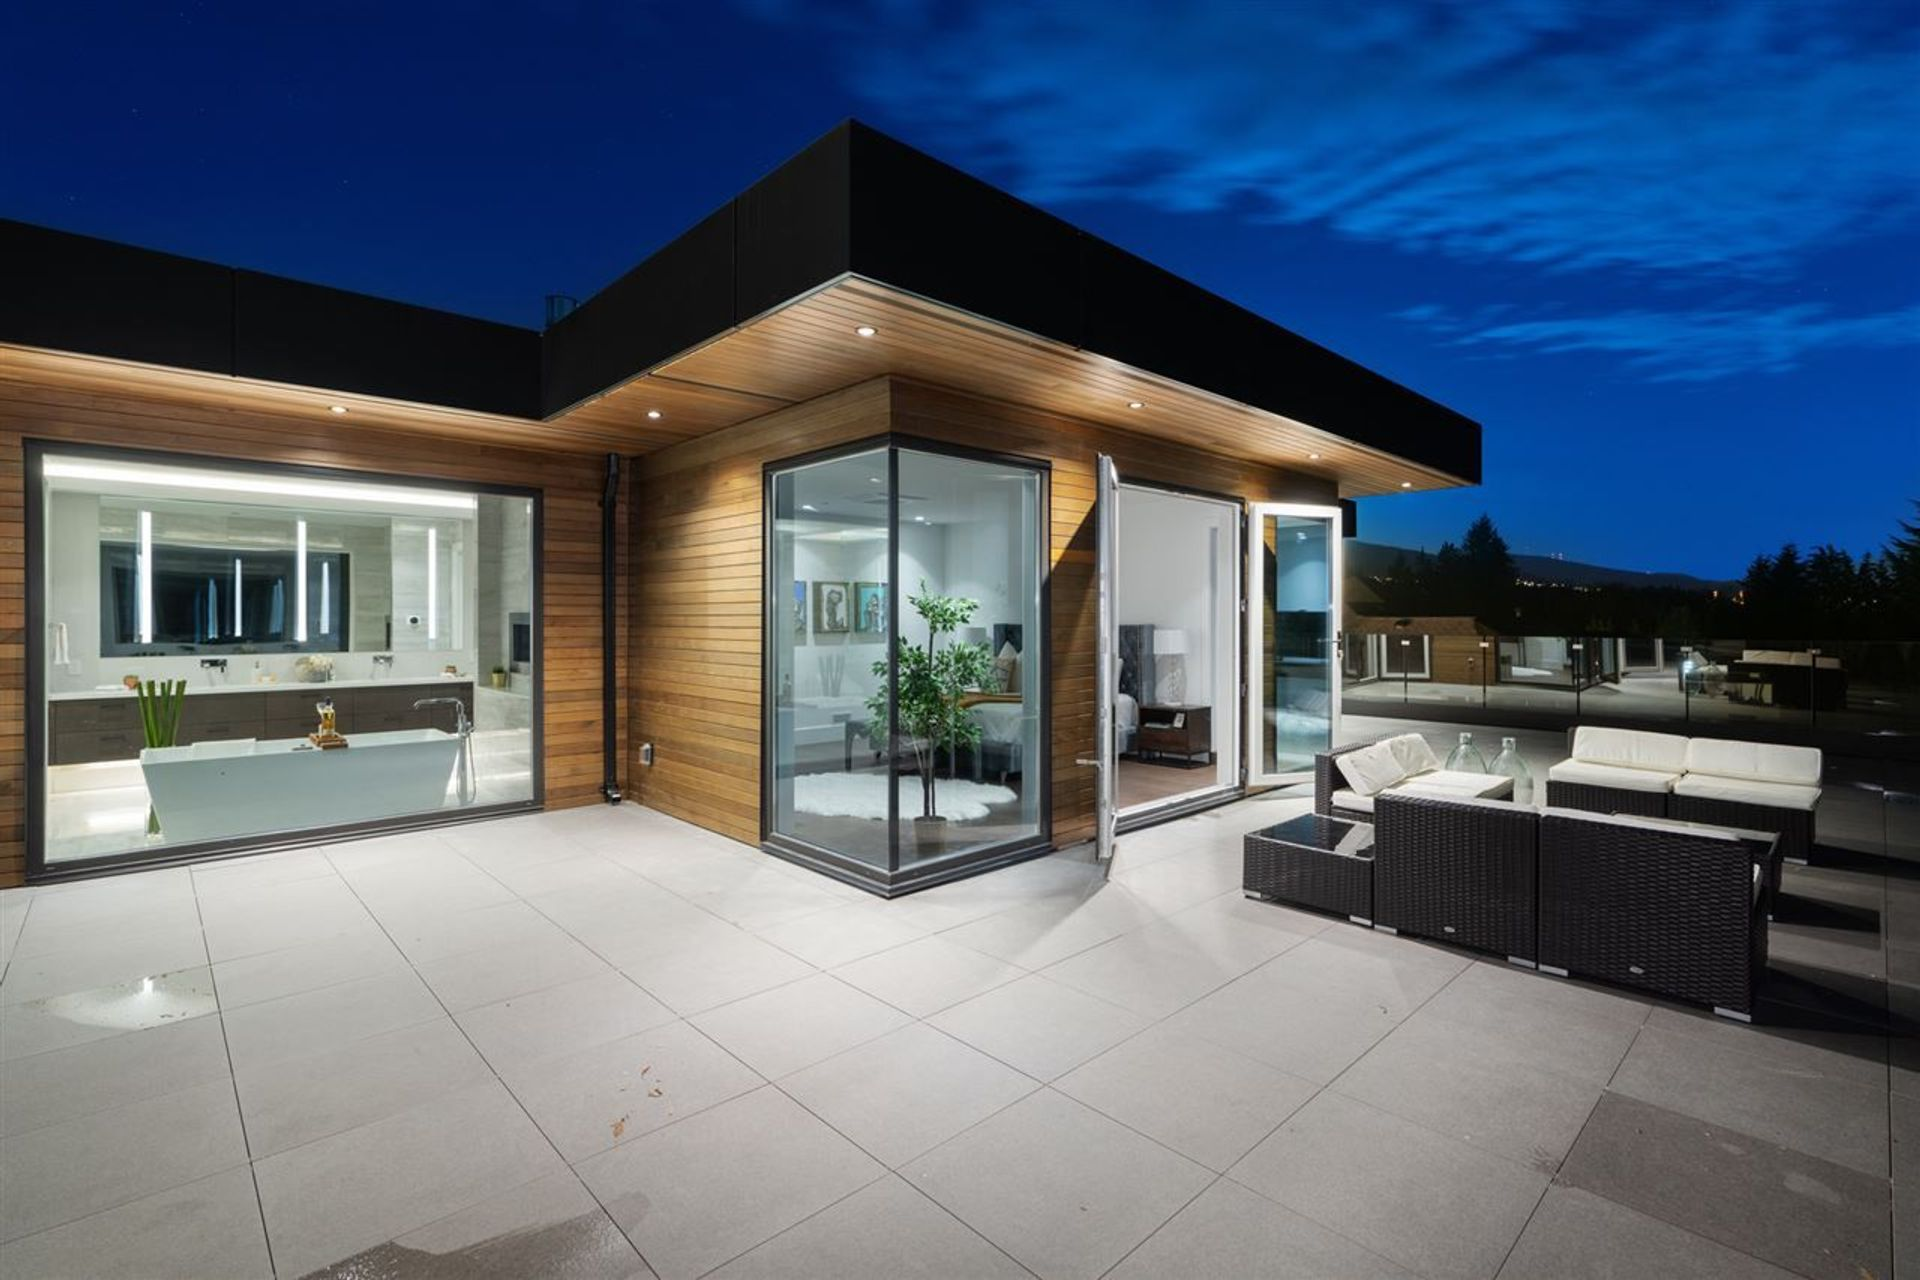 1040-wildwood-lane-british-properties-west-vancouver-15 at 1040 Wildwood Lane, British Properties, West Vancouver